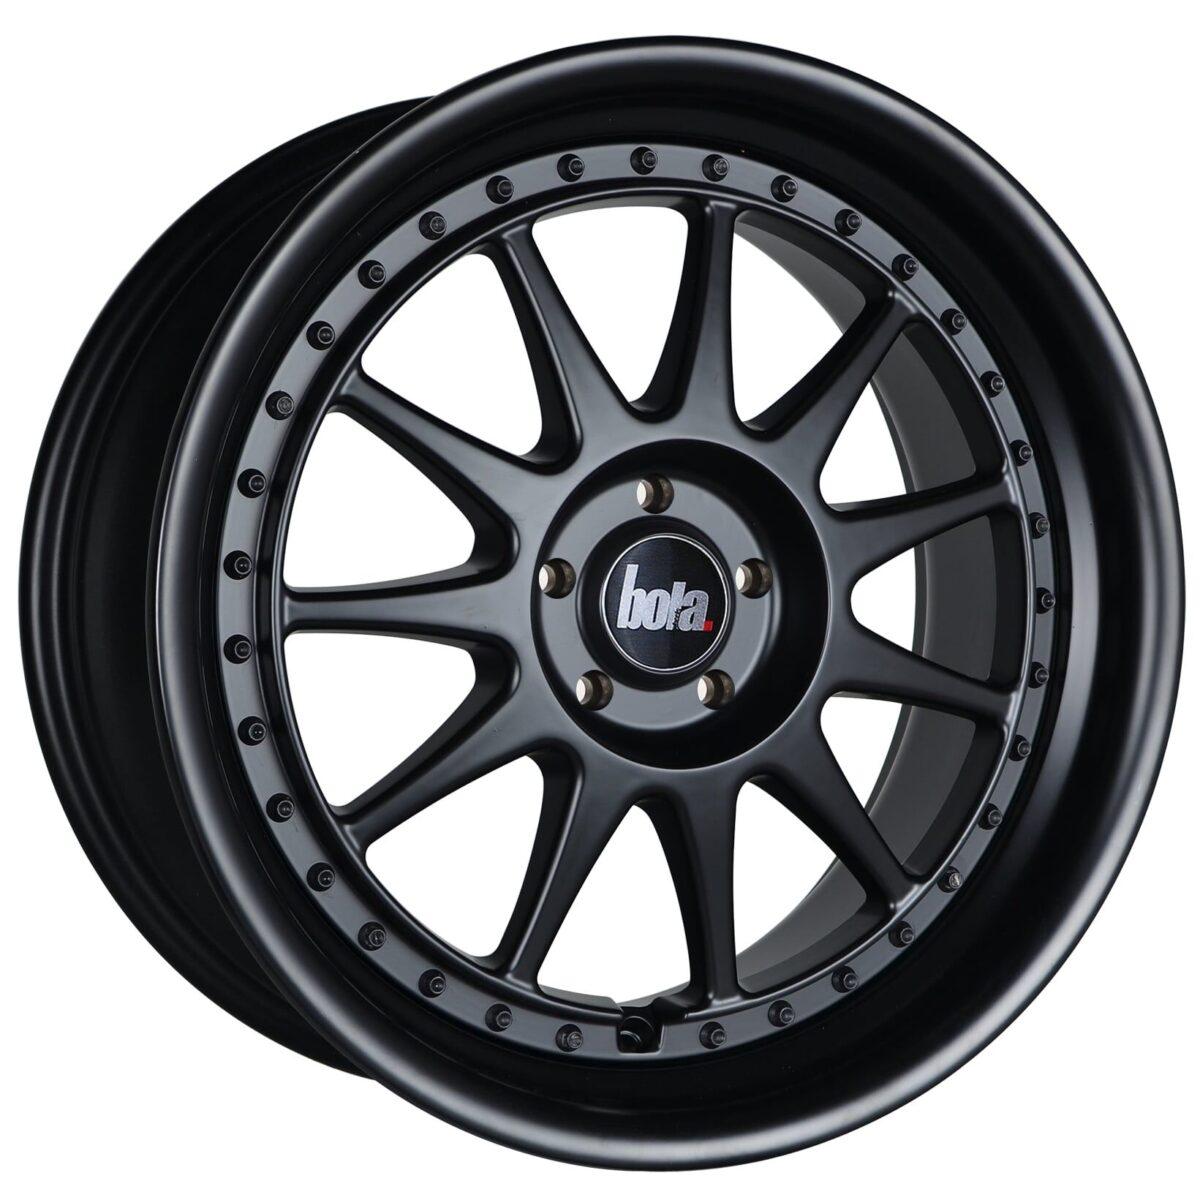 "18"" BOLA B4 Wheels - Matt Black with Black Rivets - VW / Audi / Mercedes - 5x112"